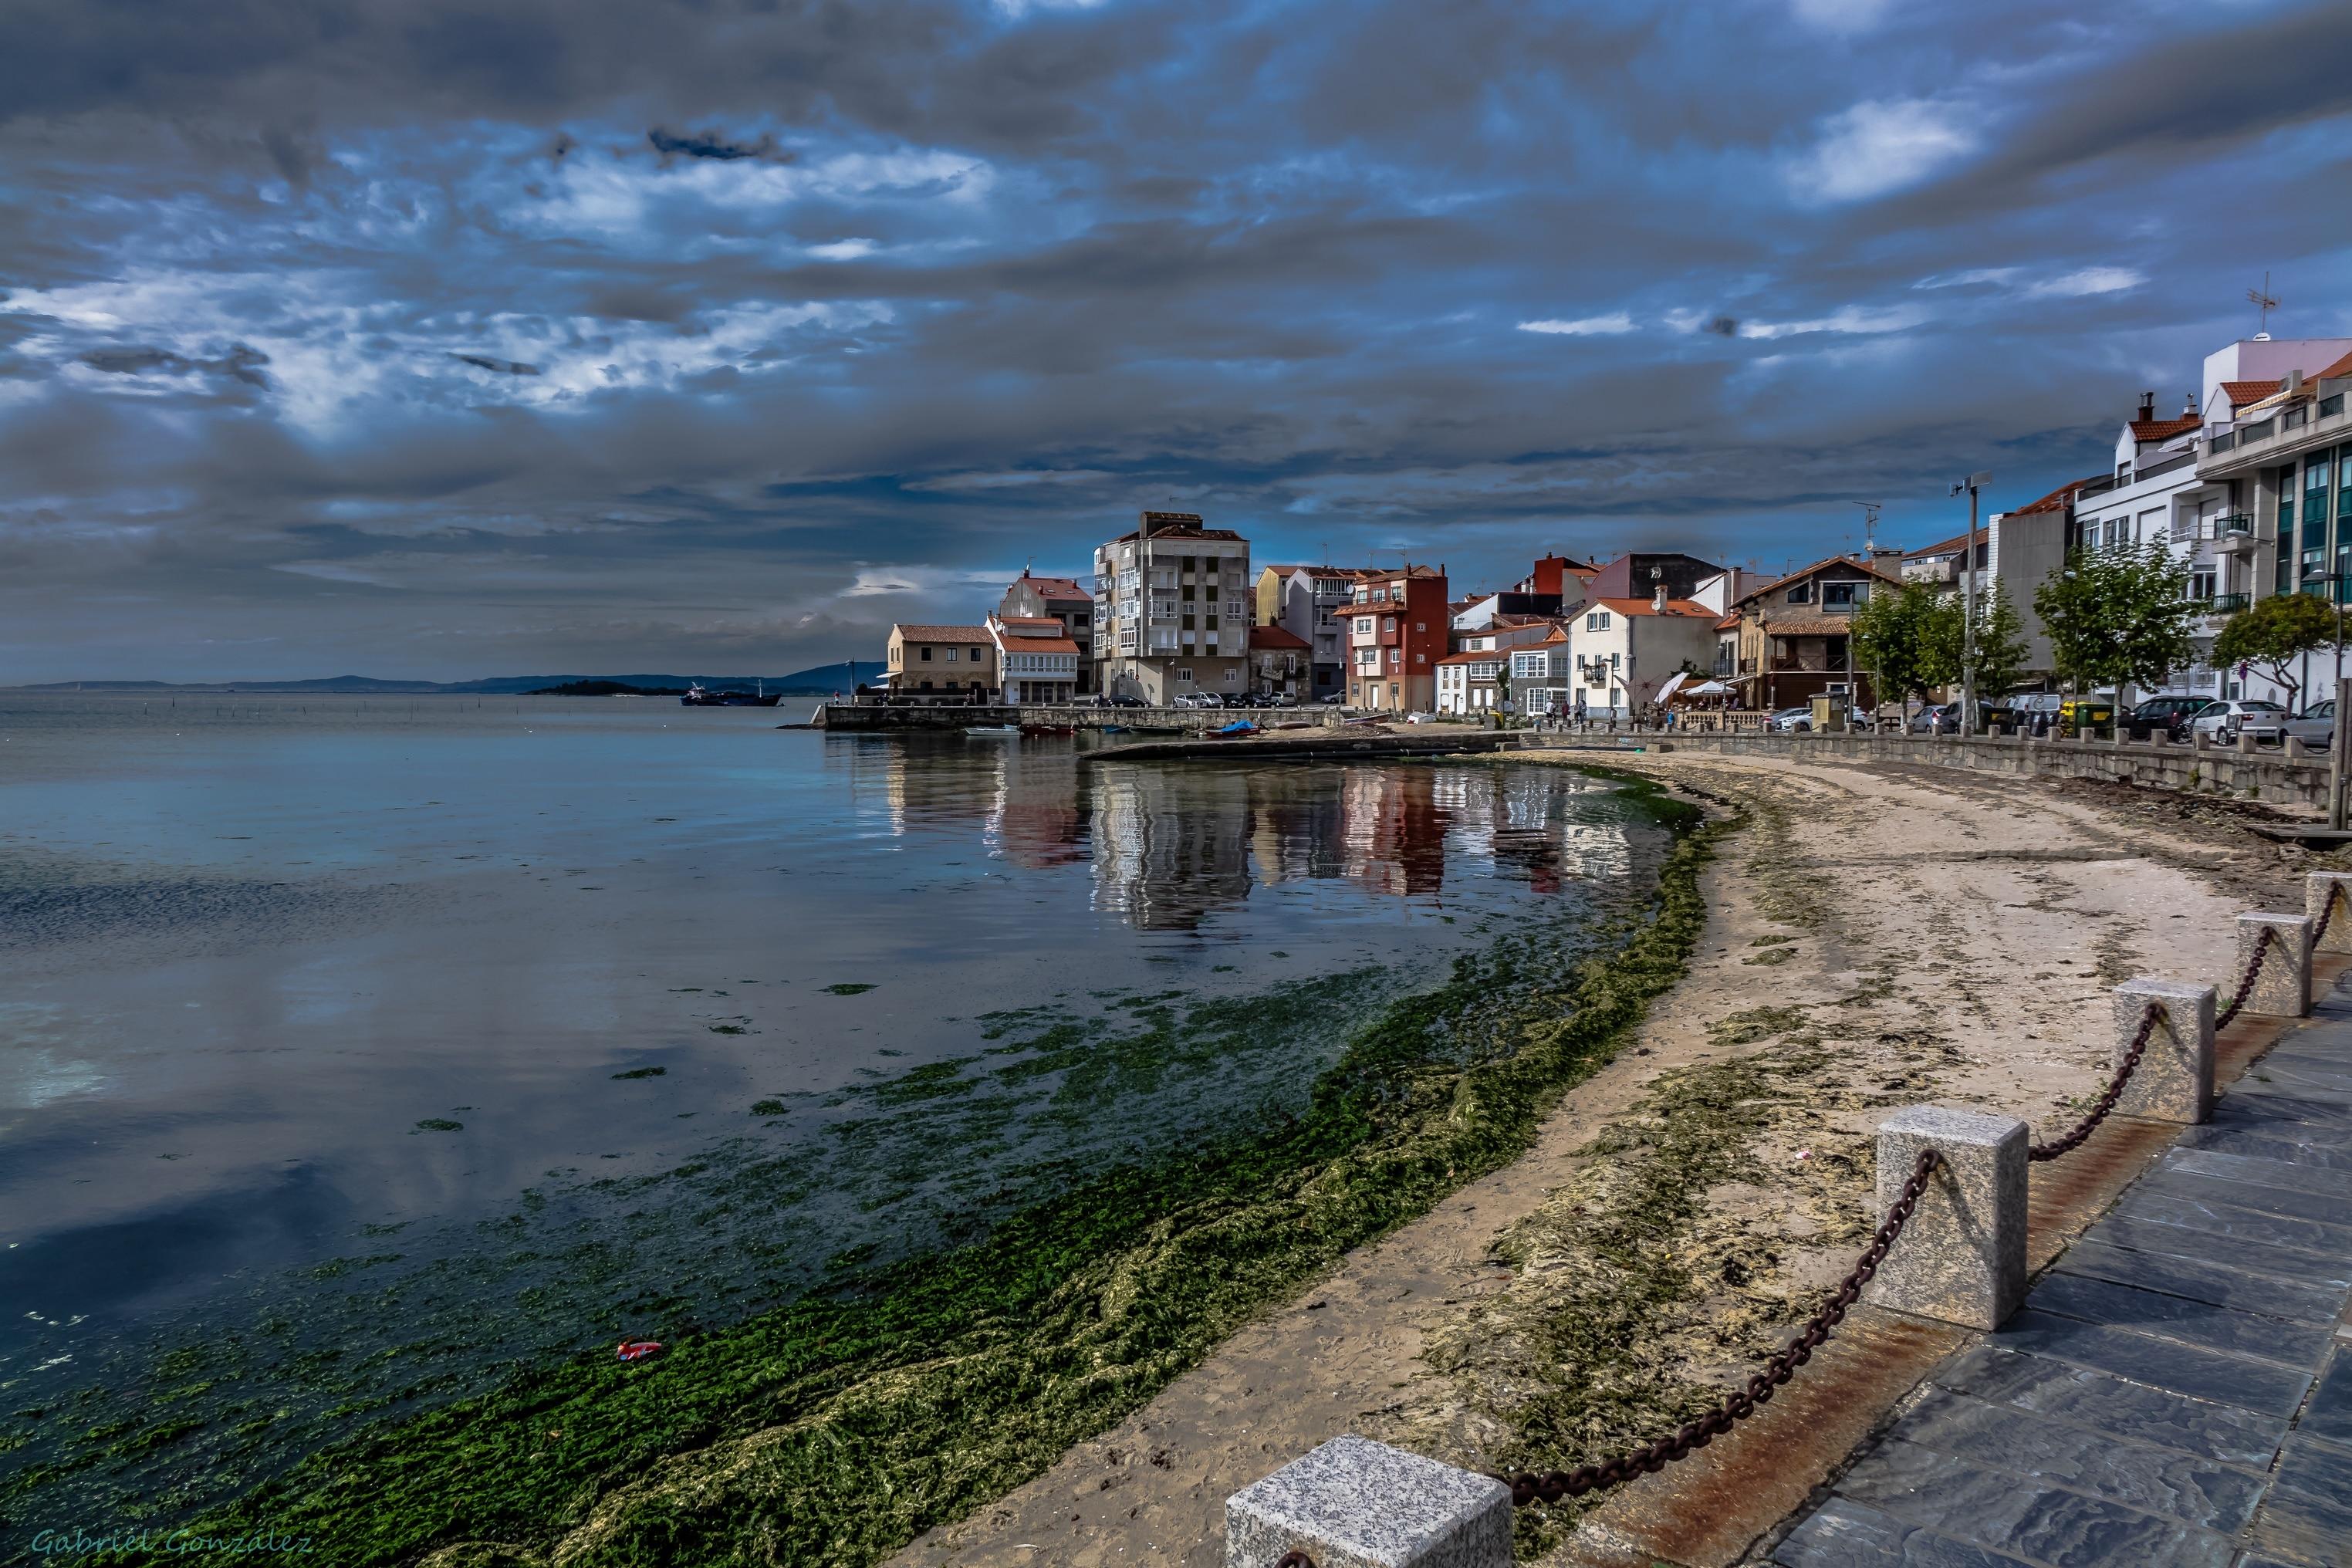 Strand von Compostela, Vilagarcía de Arousa, Galizien, Spanien